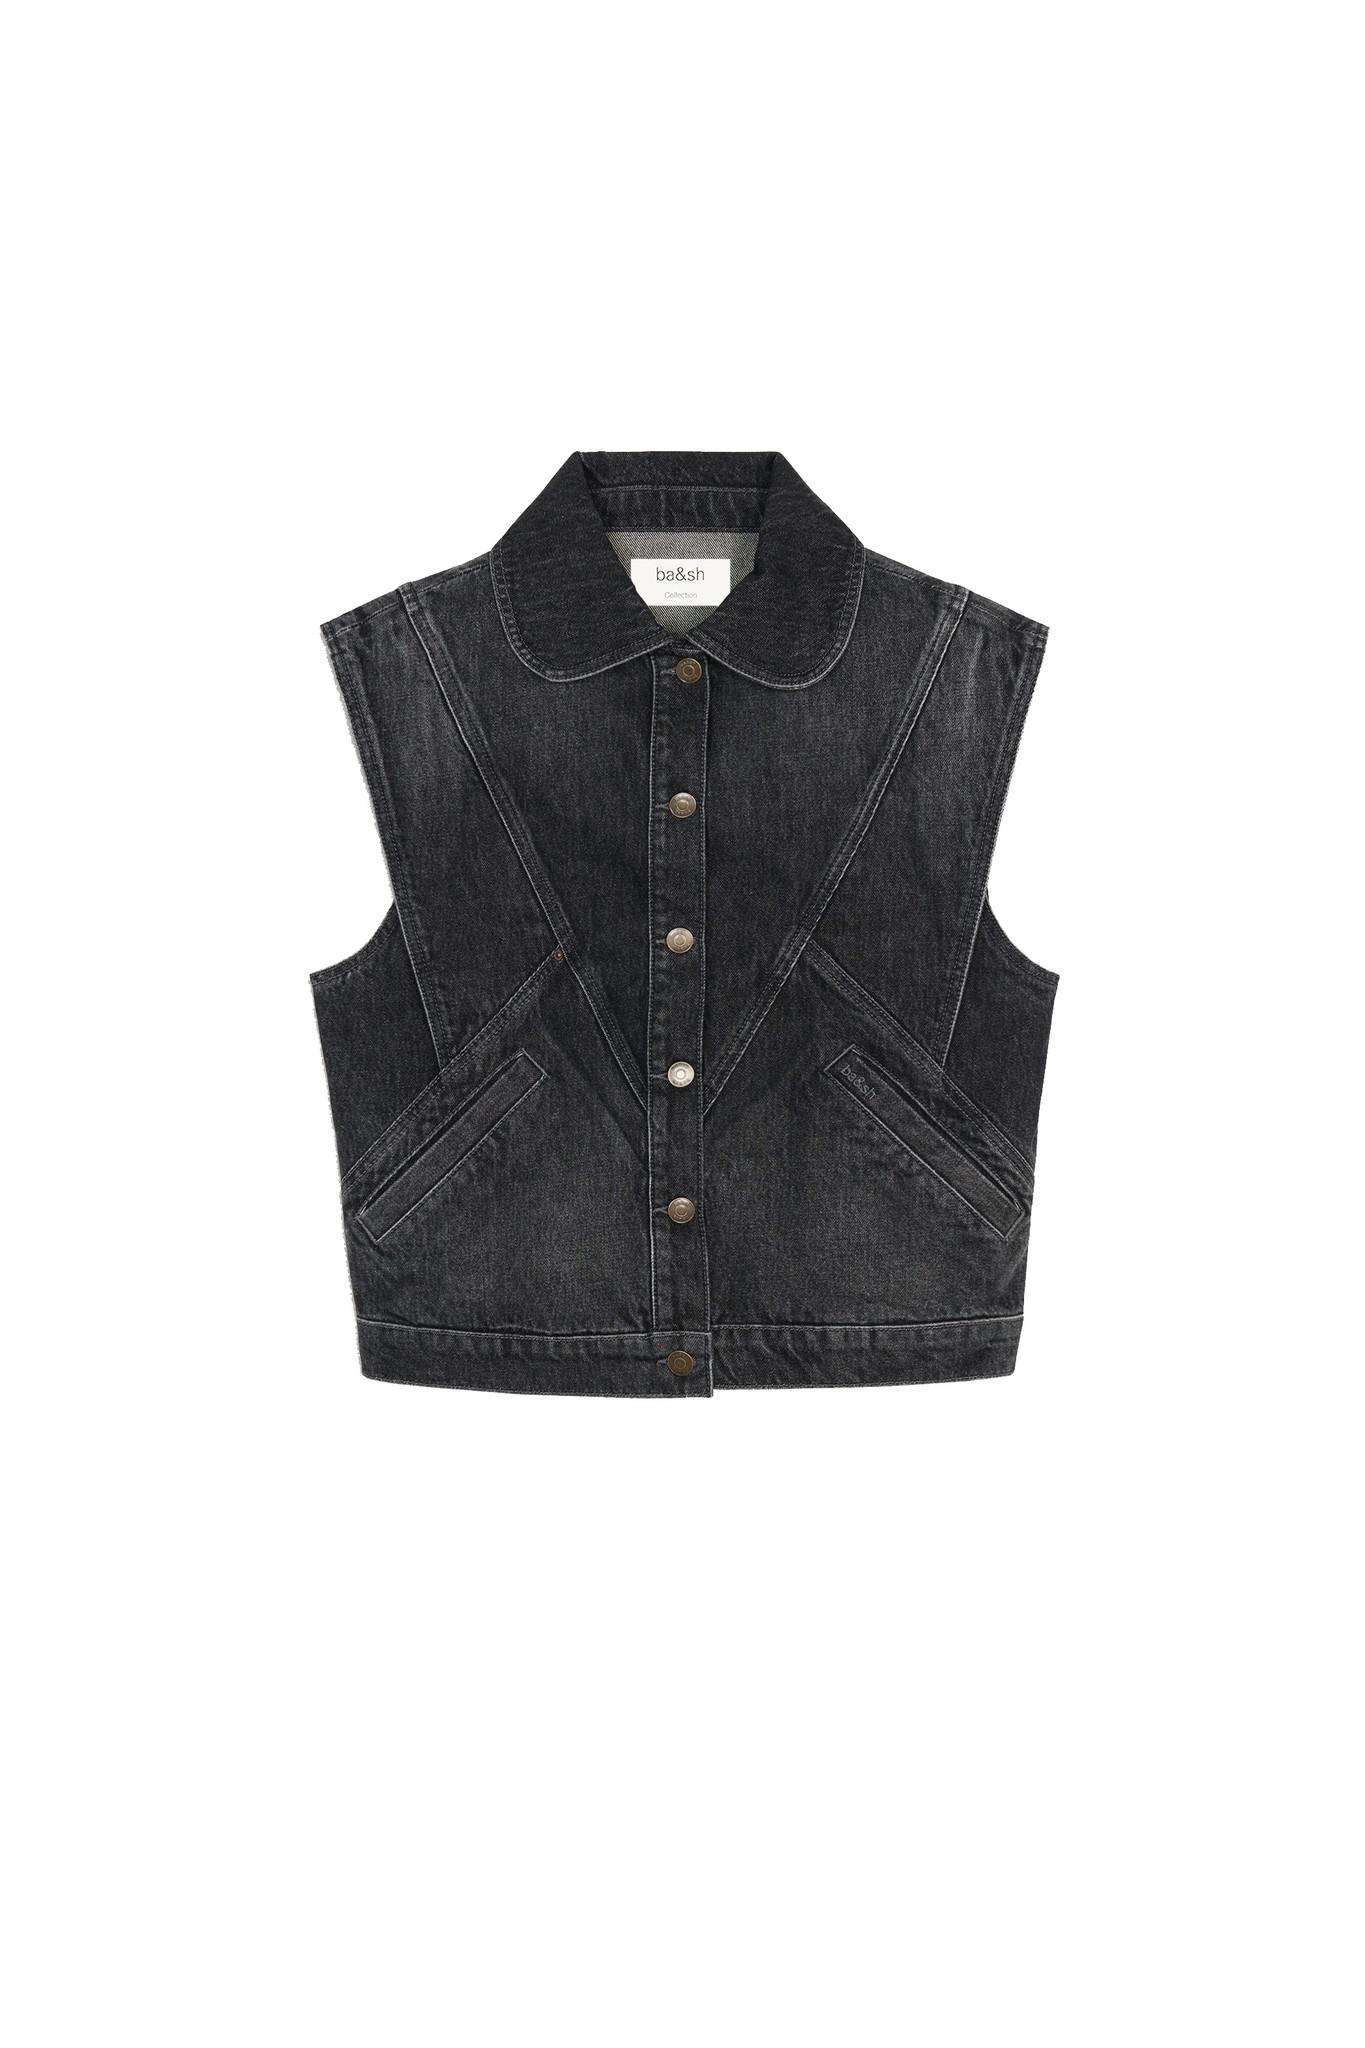 Max Jacket - Blackstone-1